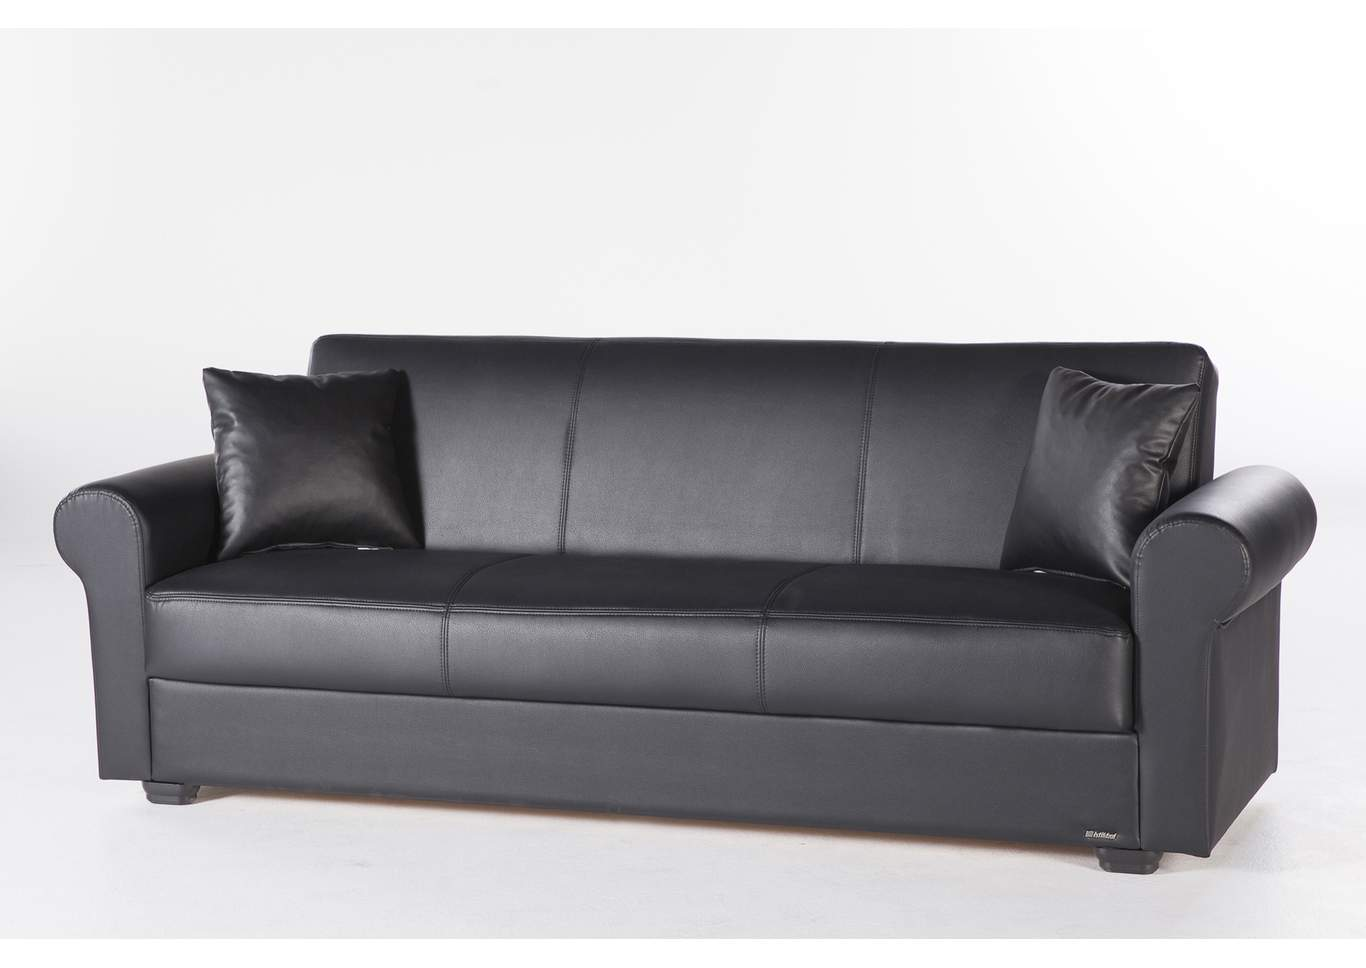 Terrific Direct Deal Furniture Floris Santa Glory Black 3 Piece Sofa Set Unemploymentrelief Wooden Chair Designs For Living Room Unemploymentrelieforg